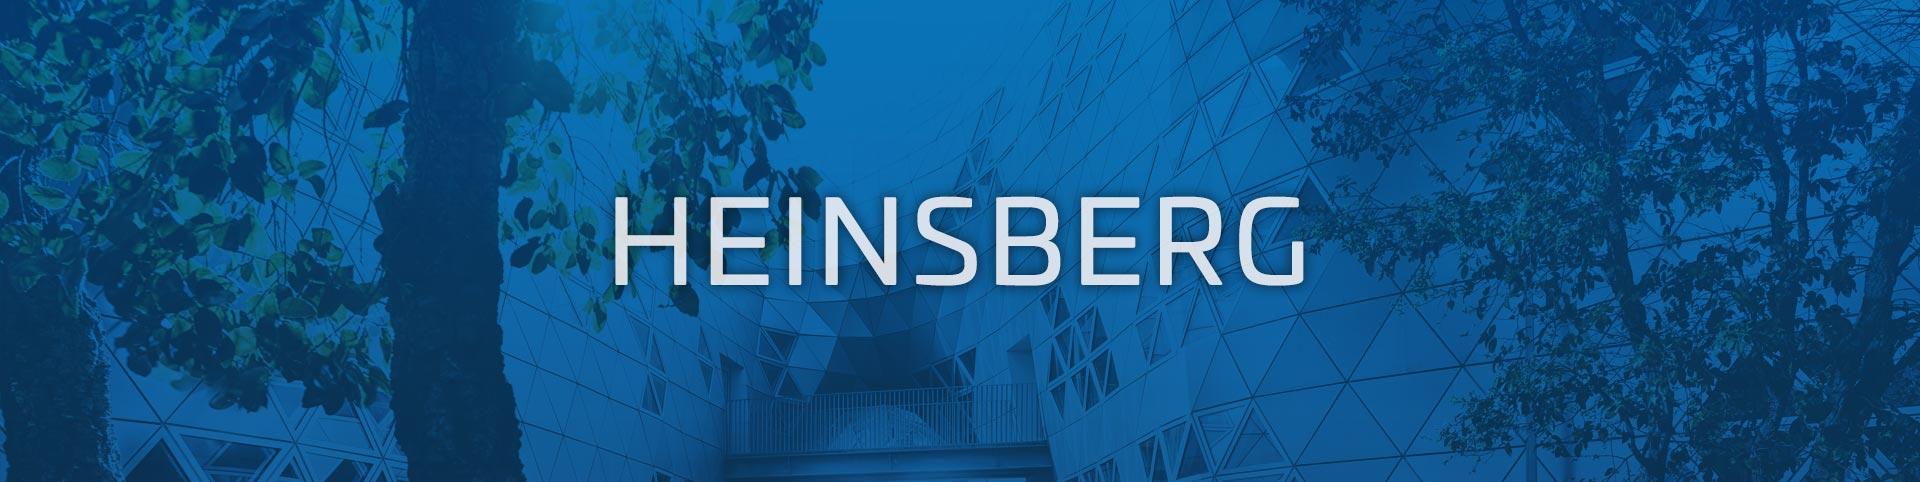 Autozentrum P&A Heinsberg